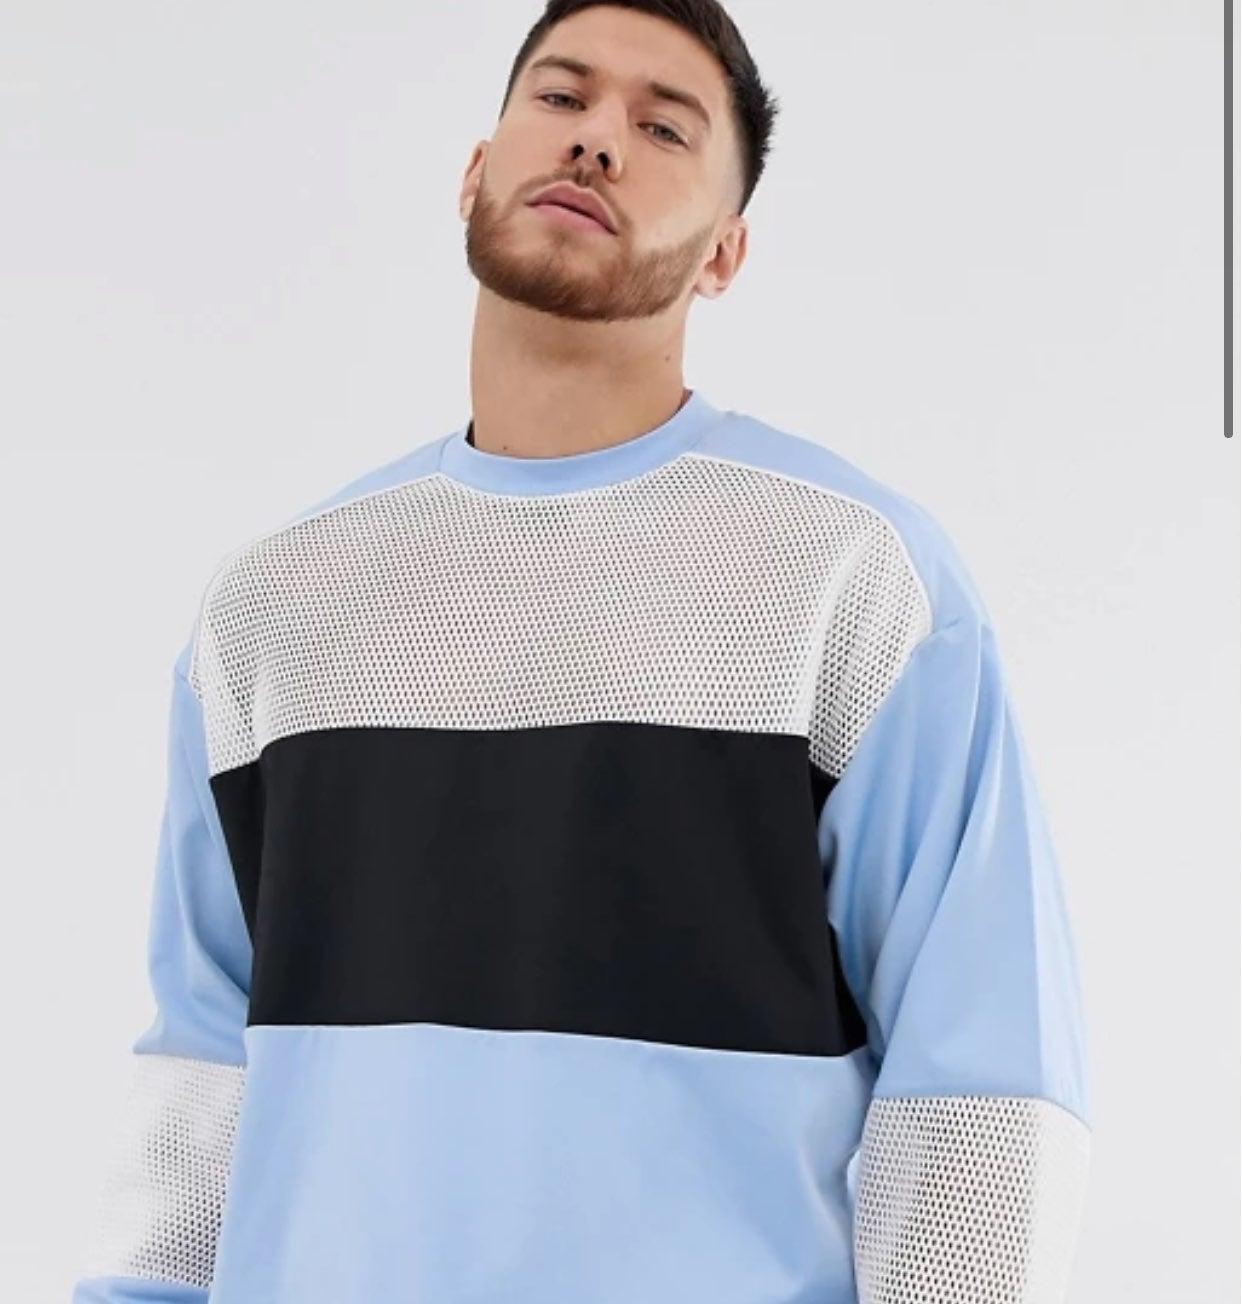 ASOS Mens Crewneck Sweatshirt